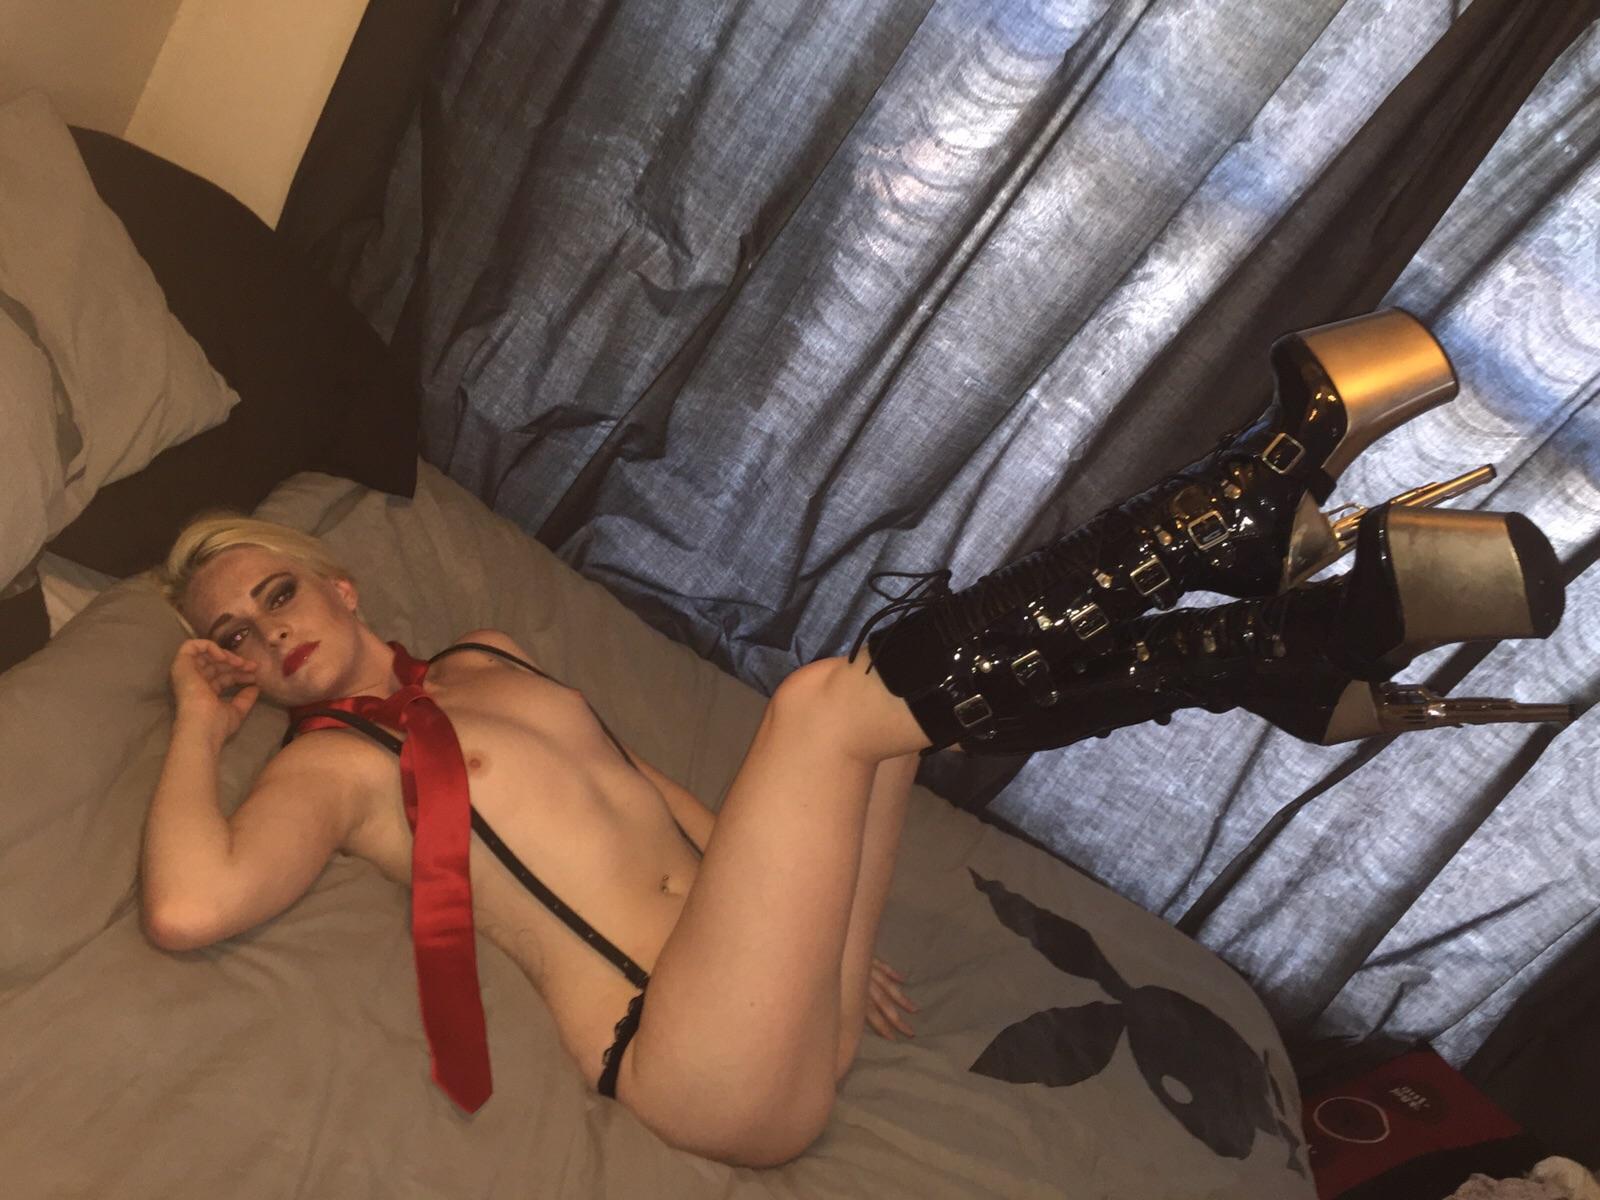 Gorgeous girl using vibrator